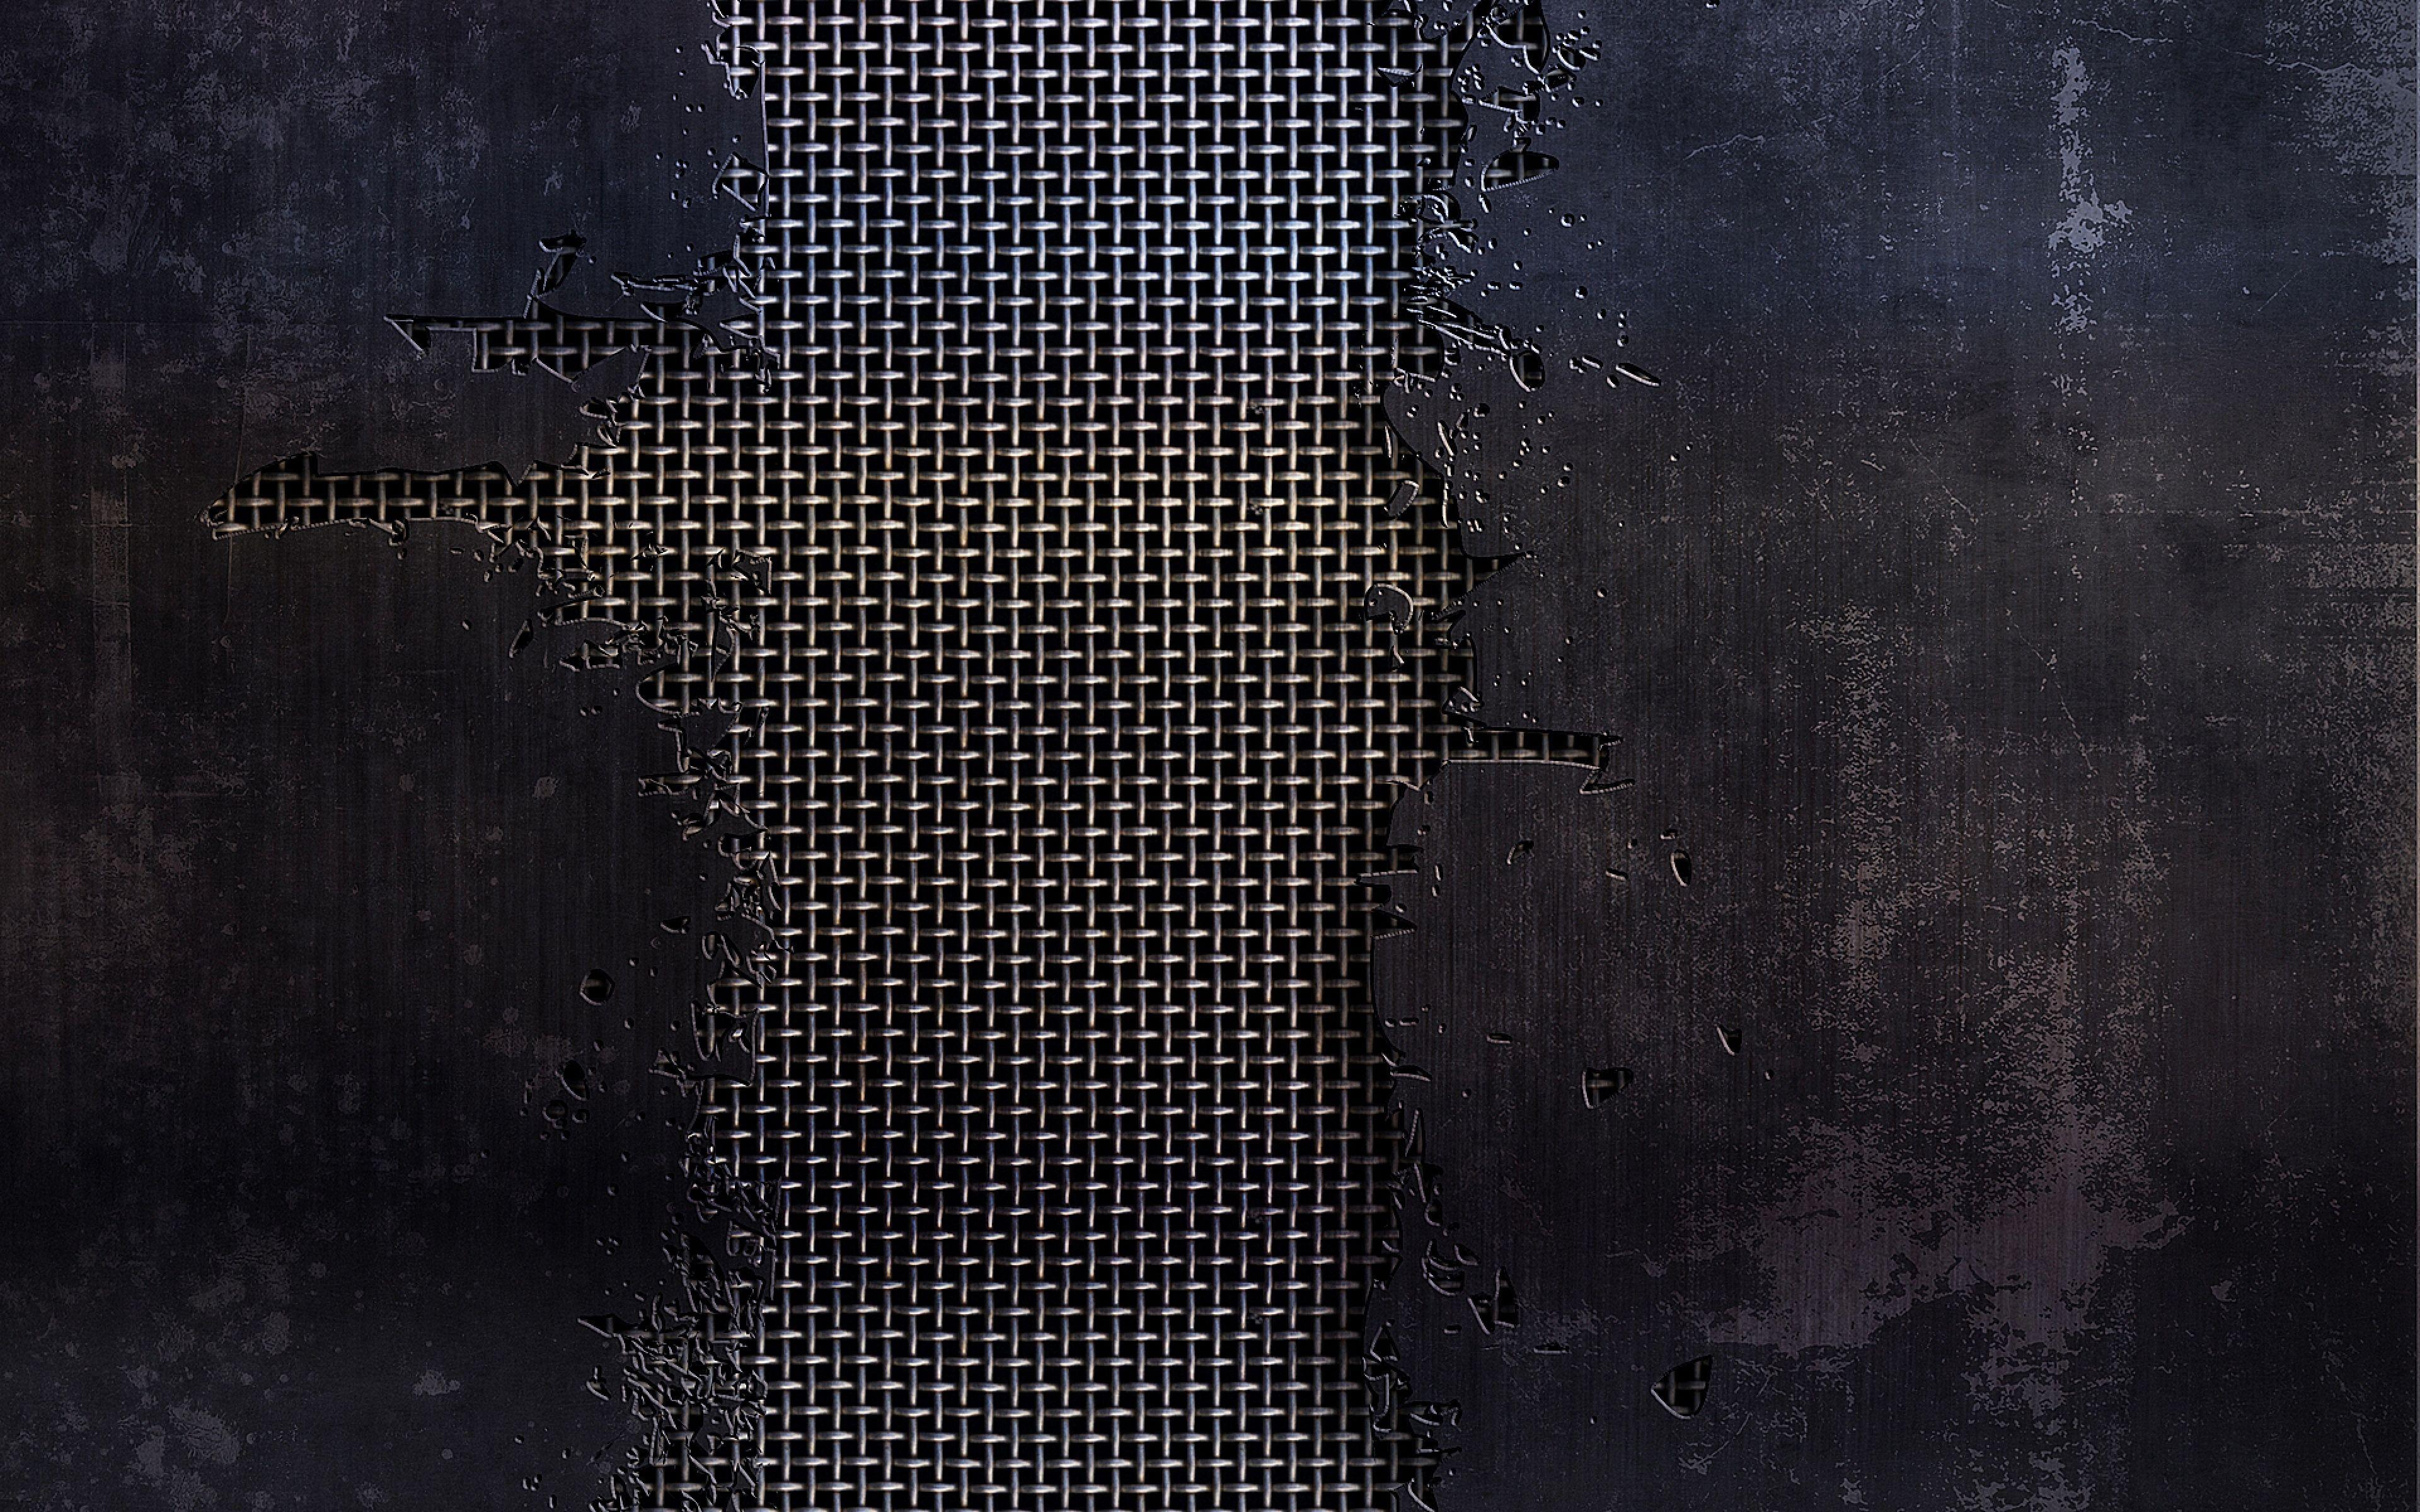 Black Metal 4k Wallpapers Top Free Black Metal 4k Backgrounds Wallpaperaccess